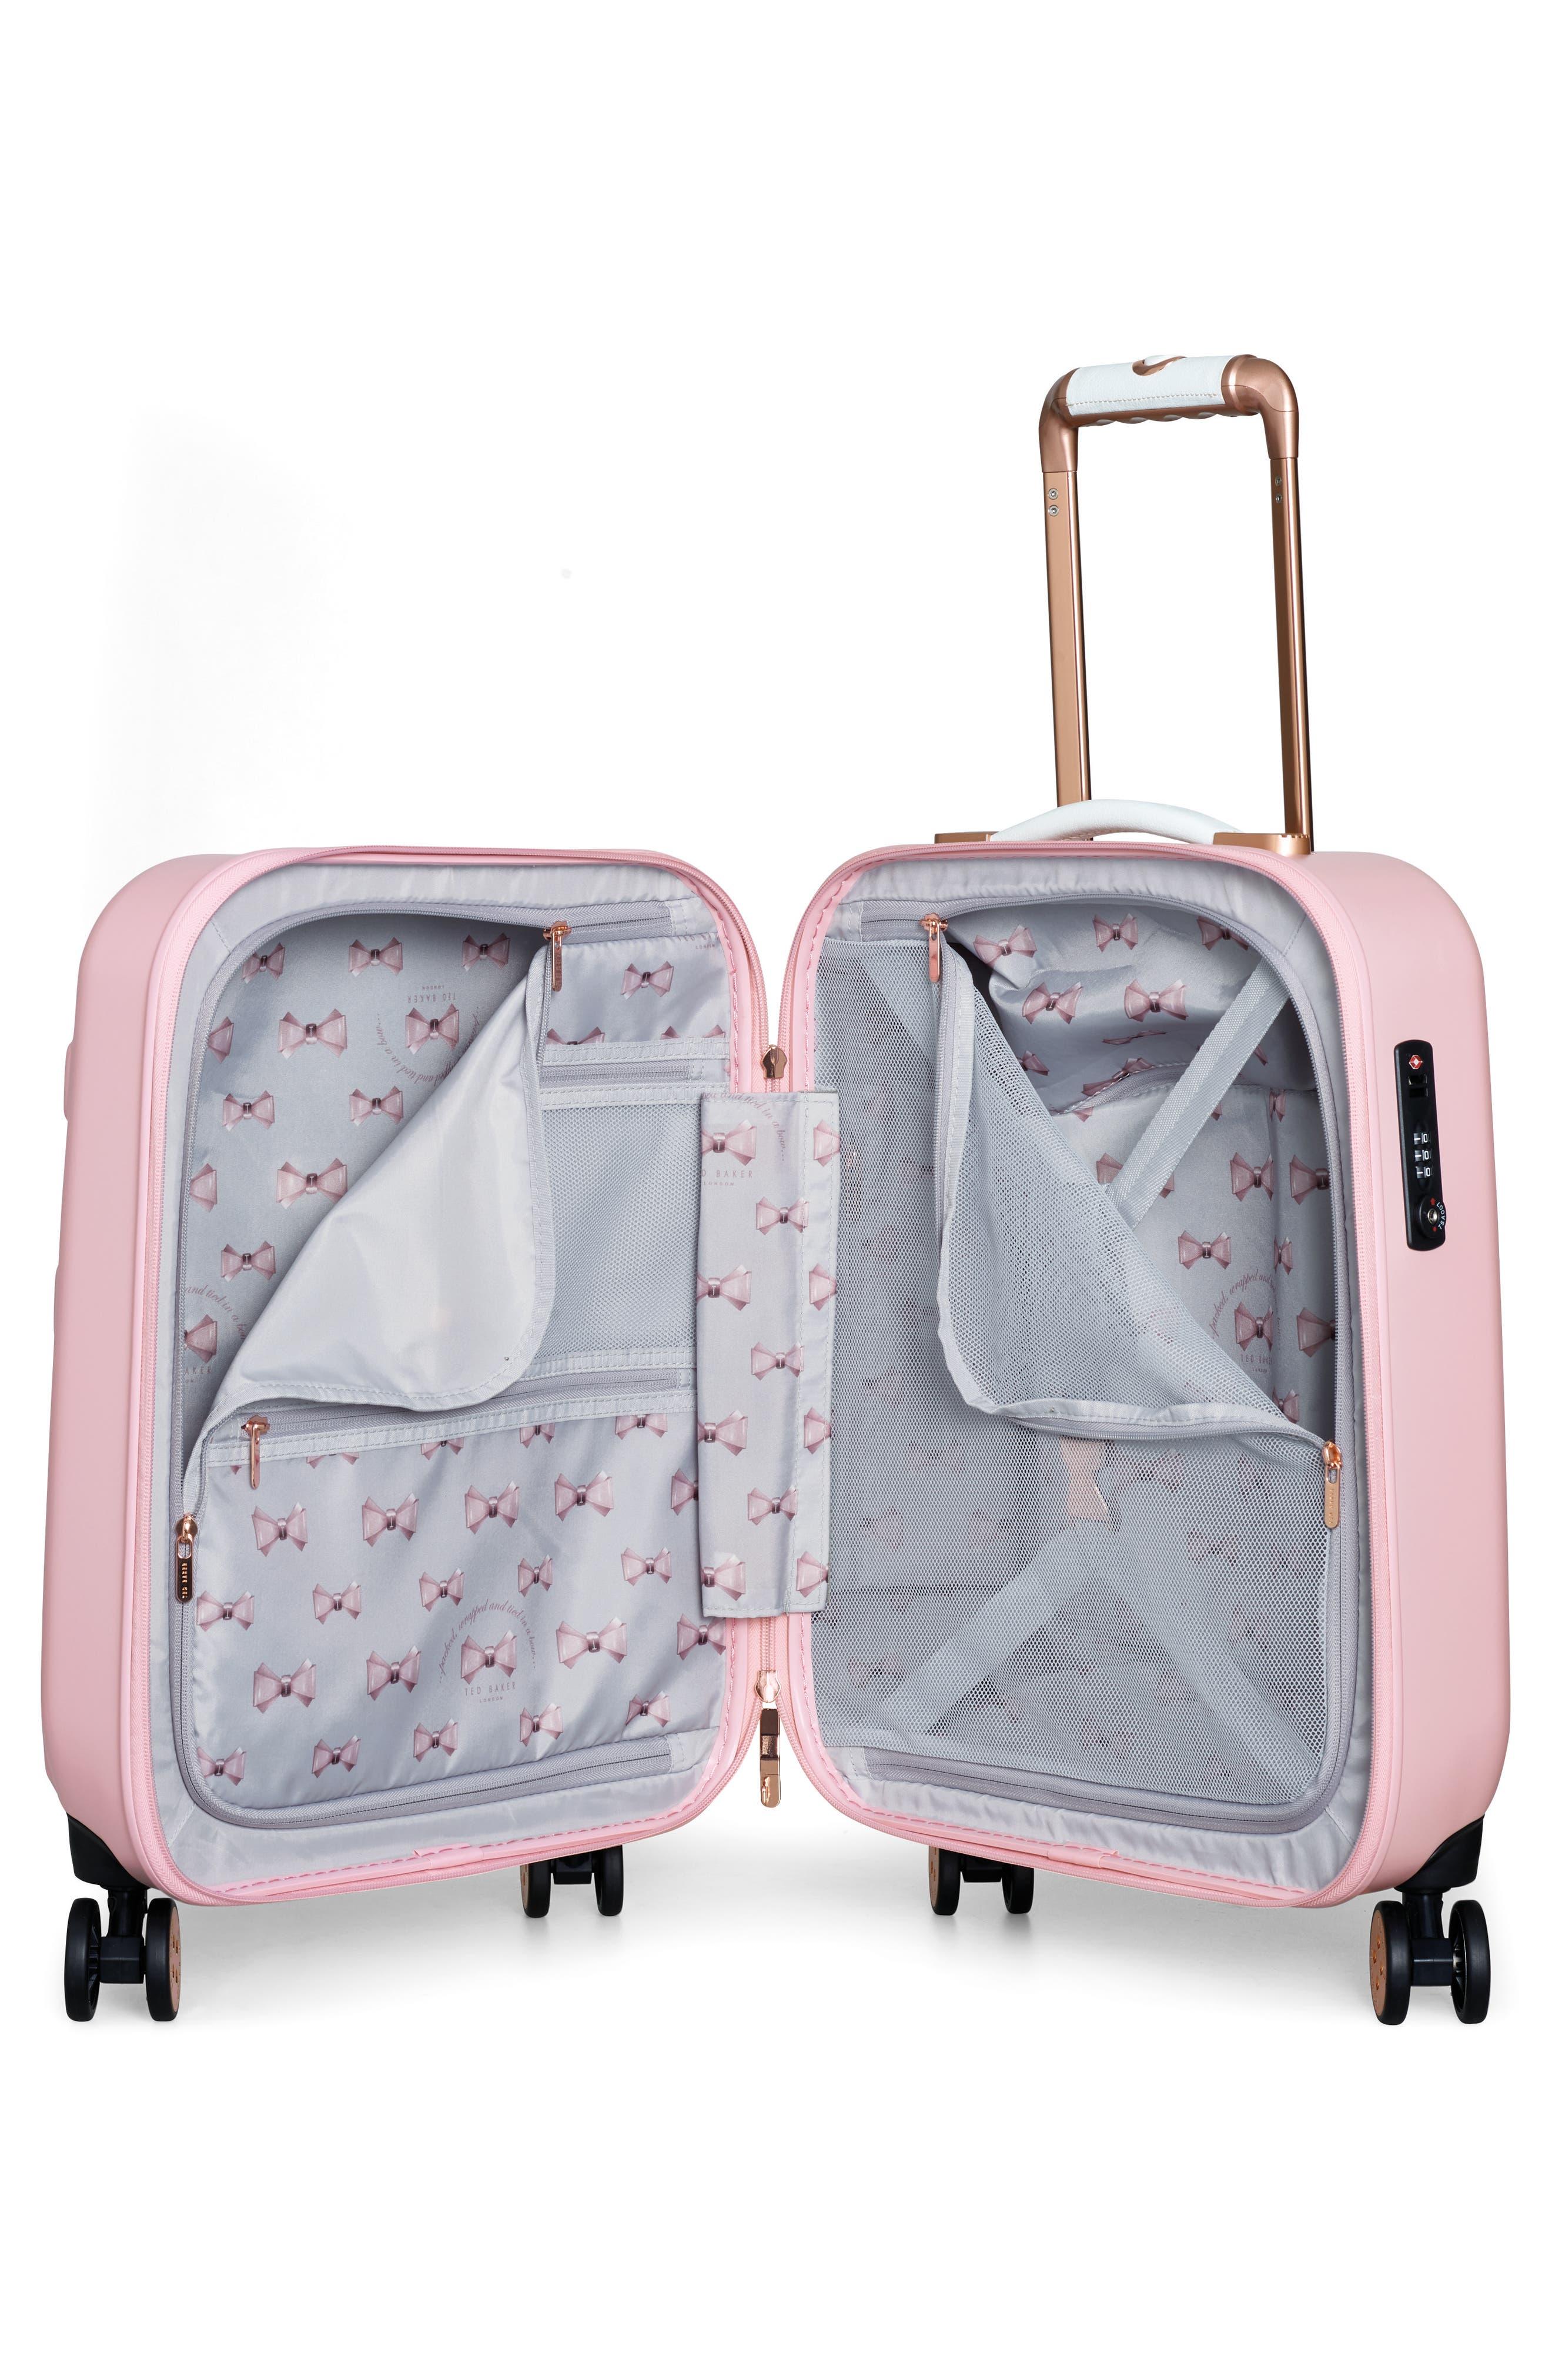 b027bd8ecafa Ted Baker London Women s Luggage Accessories